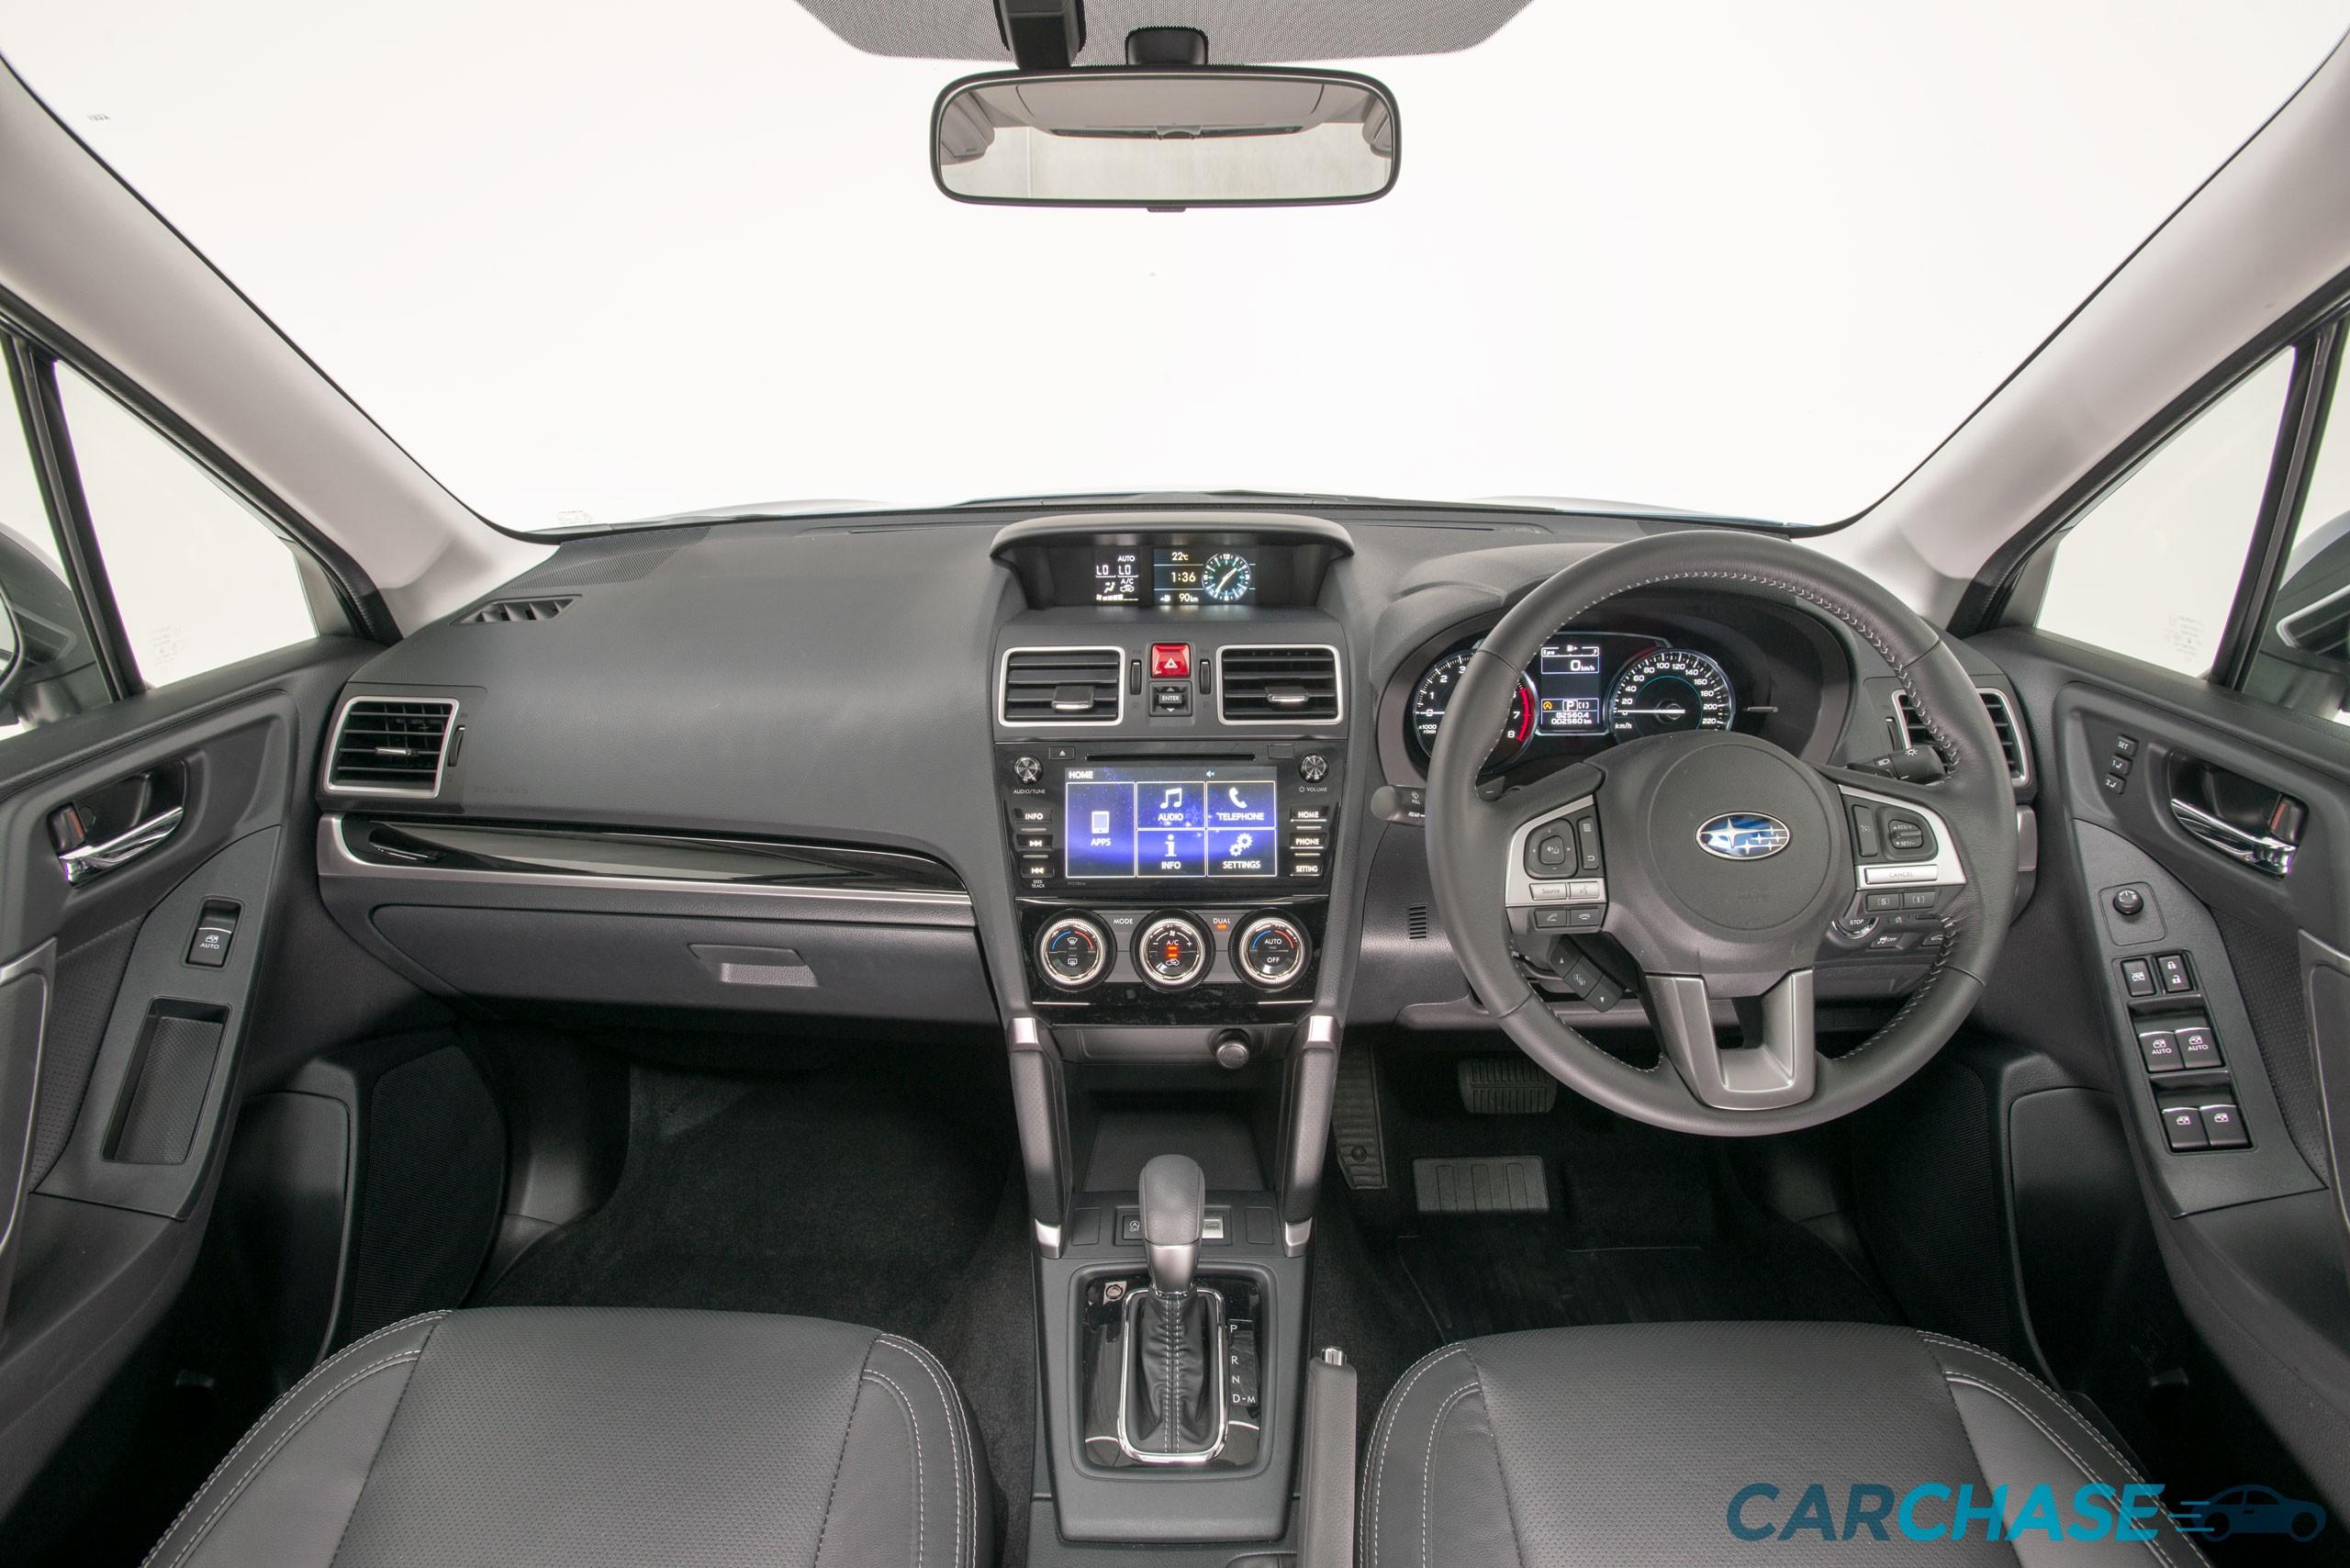 Image of dashboard profile of 2018 Subaru Forester 2.5i-L Luxury